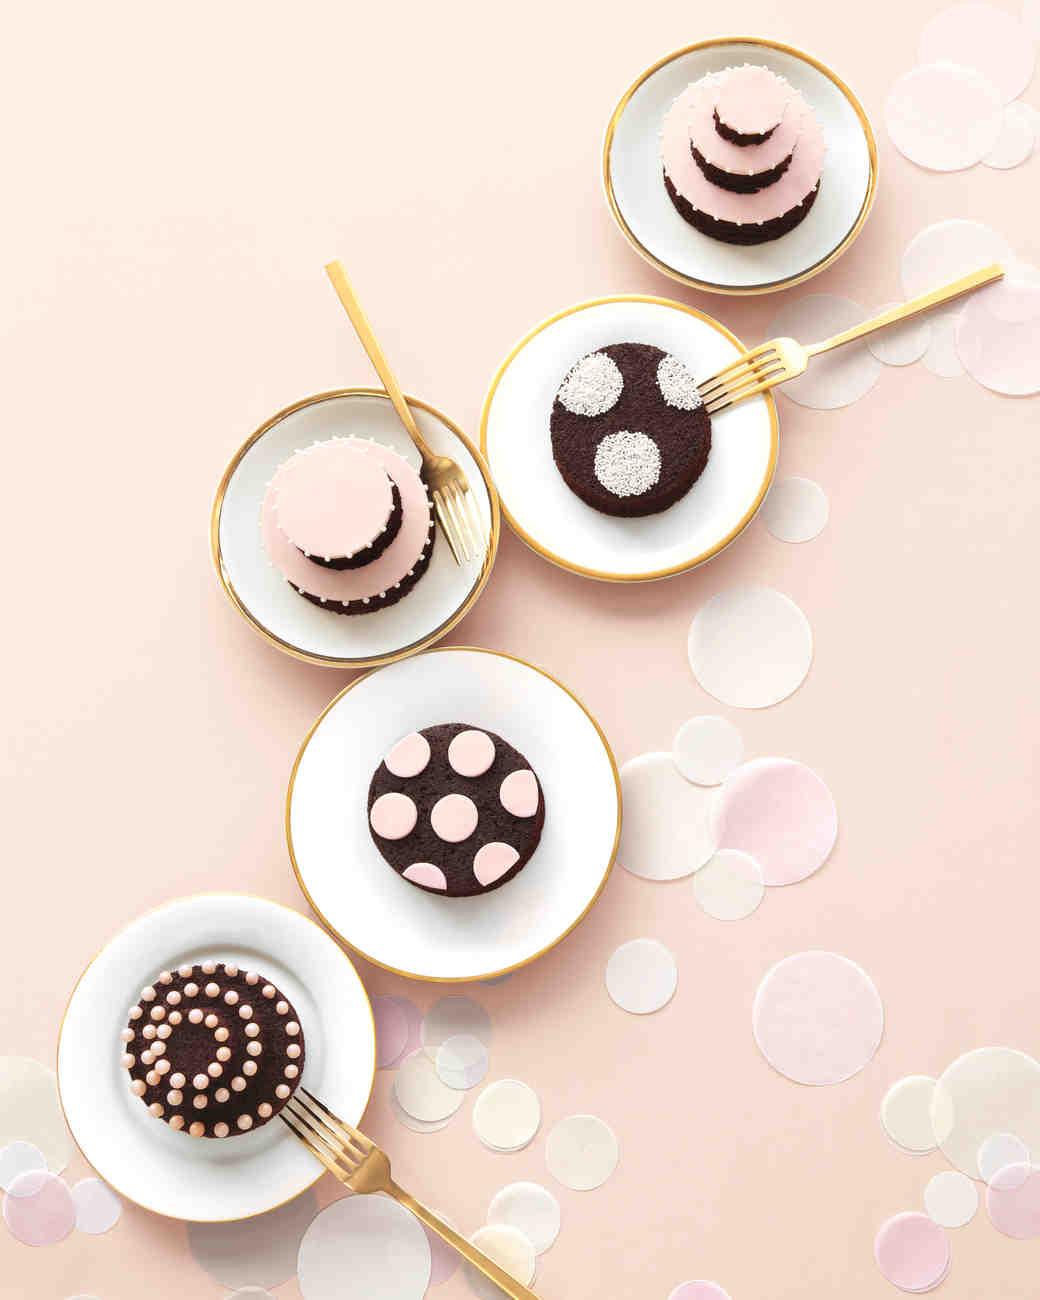 cakes-9166-mwd110012.jpg